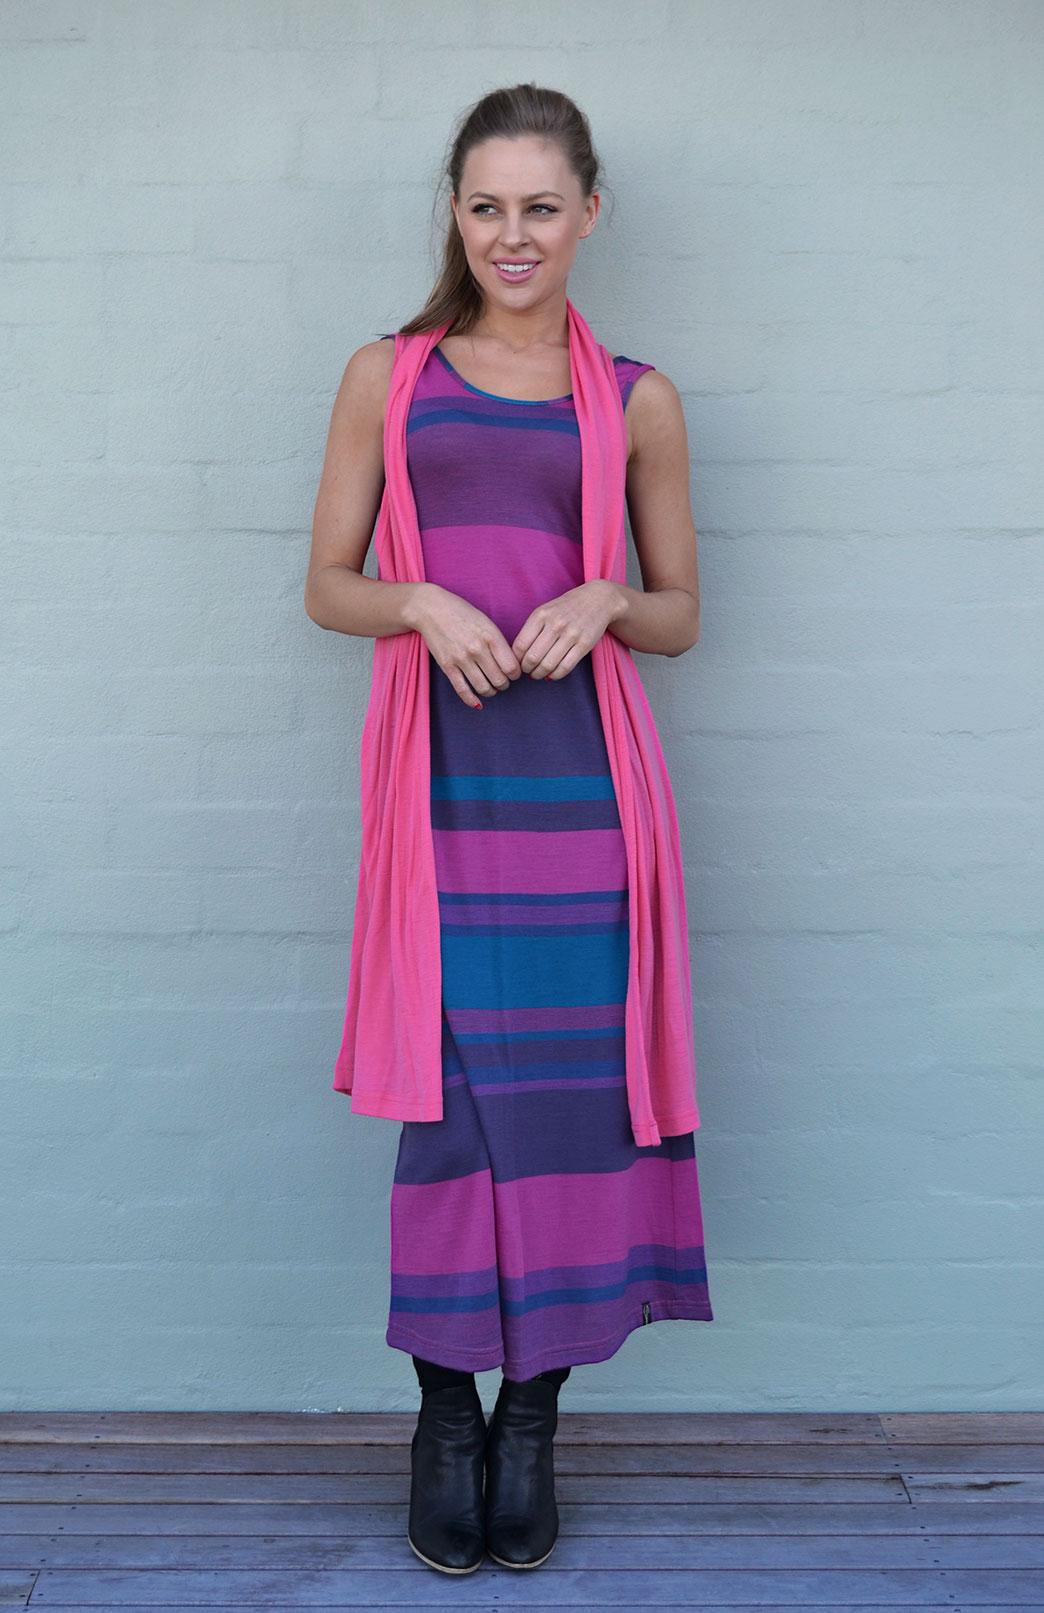 Sleeveless Long Drape Cardigan - Women's Merino Wool Sleeveless Drape Cardigan - Smitten Merino Tasmania Australia